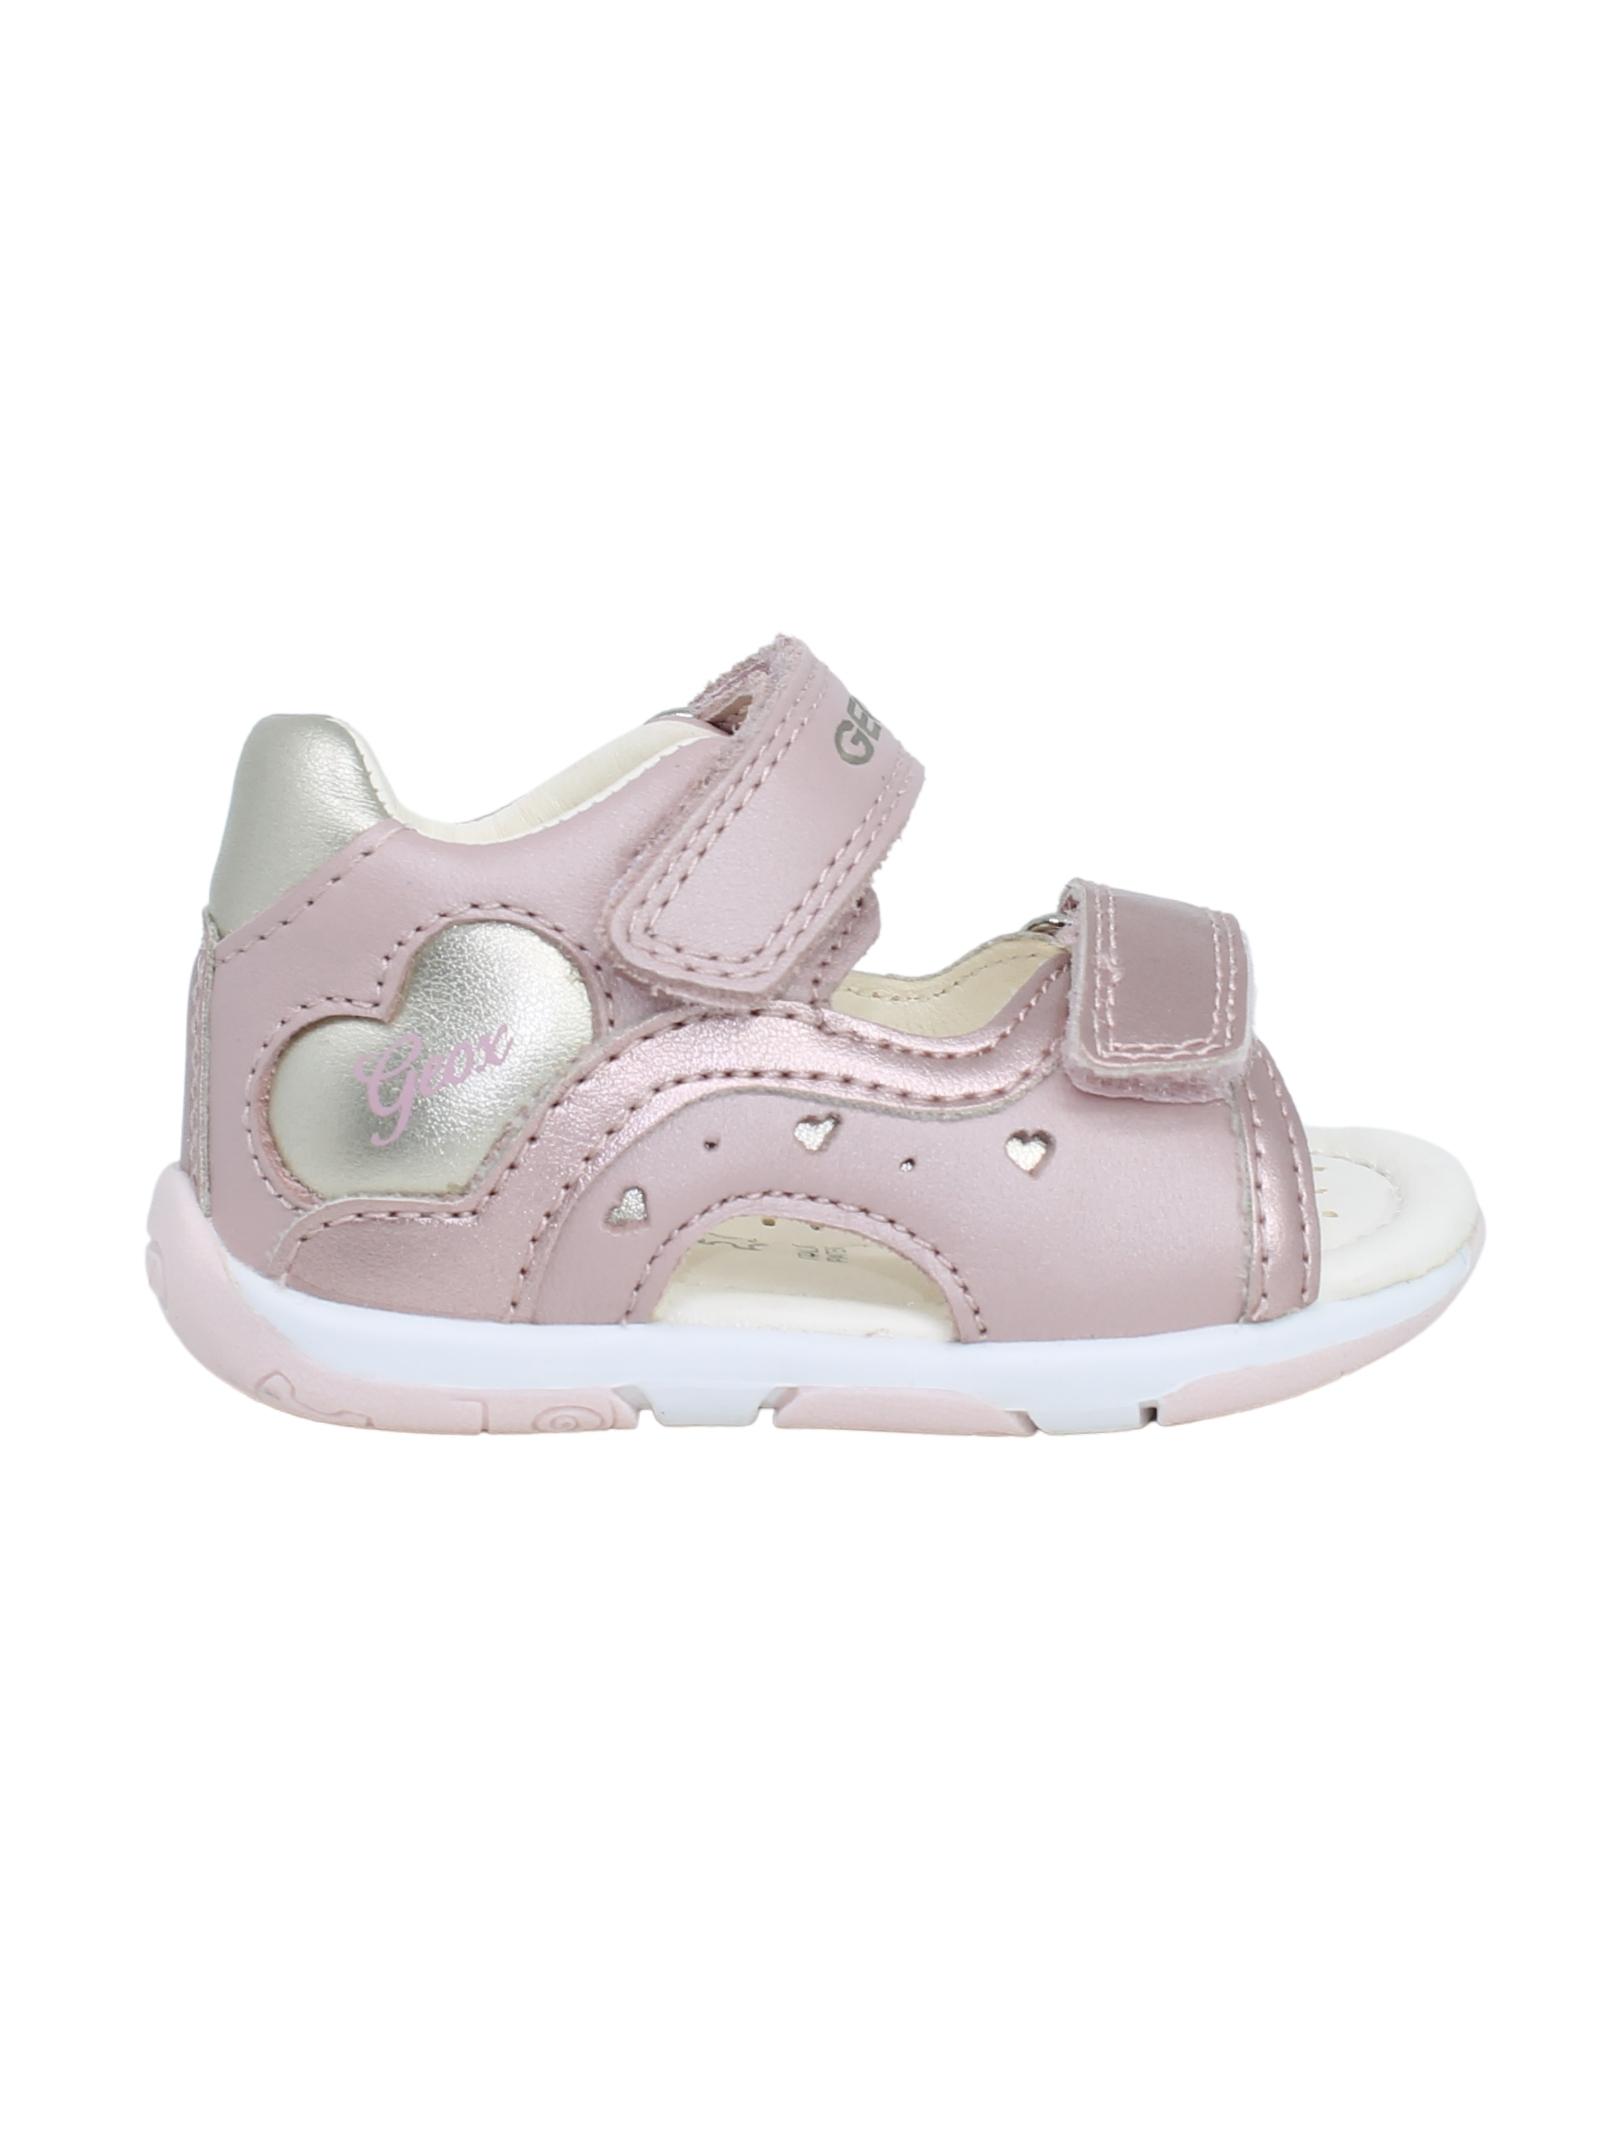 Sandali Bambina Pink GEOX KIDS | Sandali | 7326ROSA